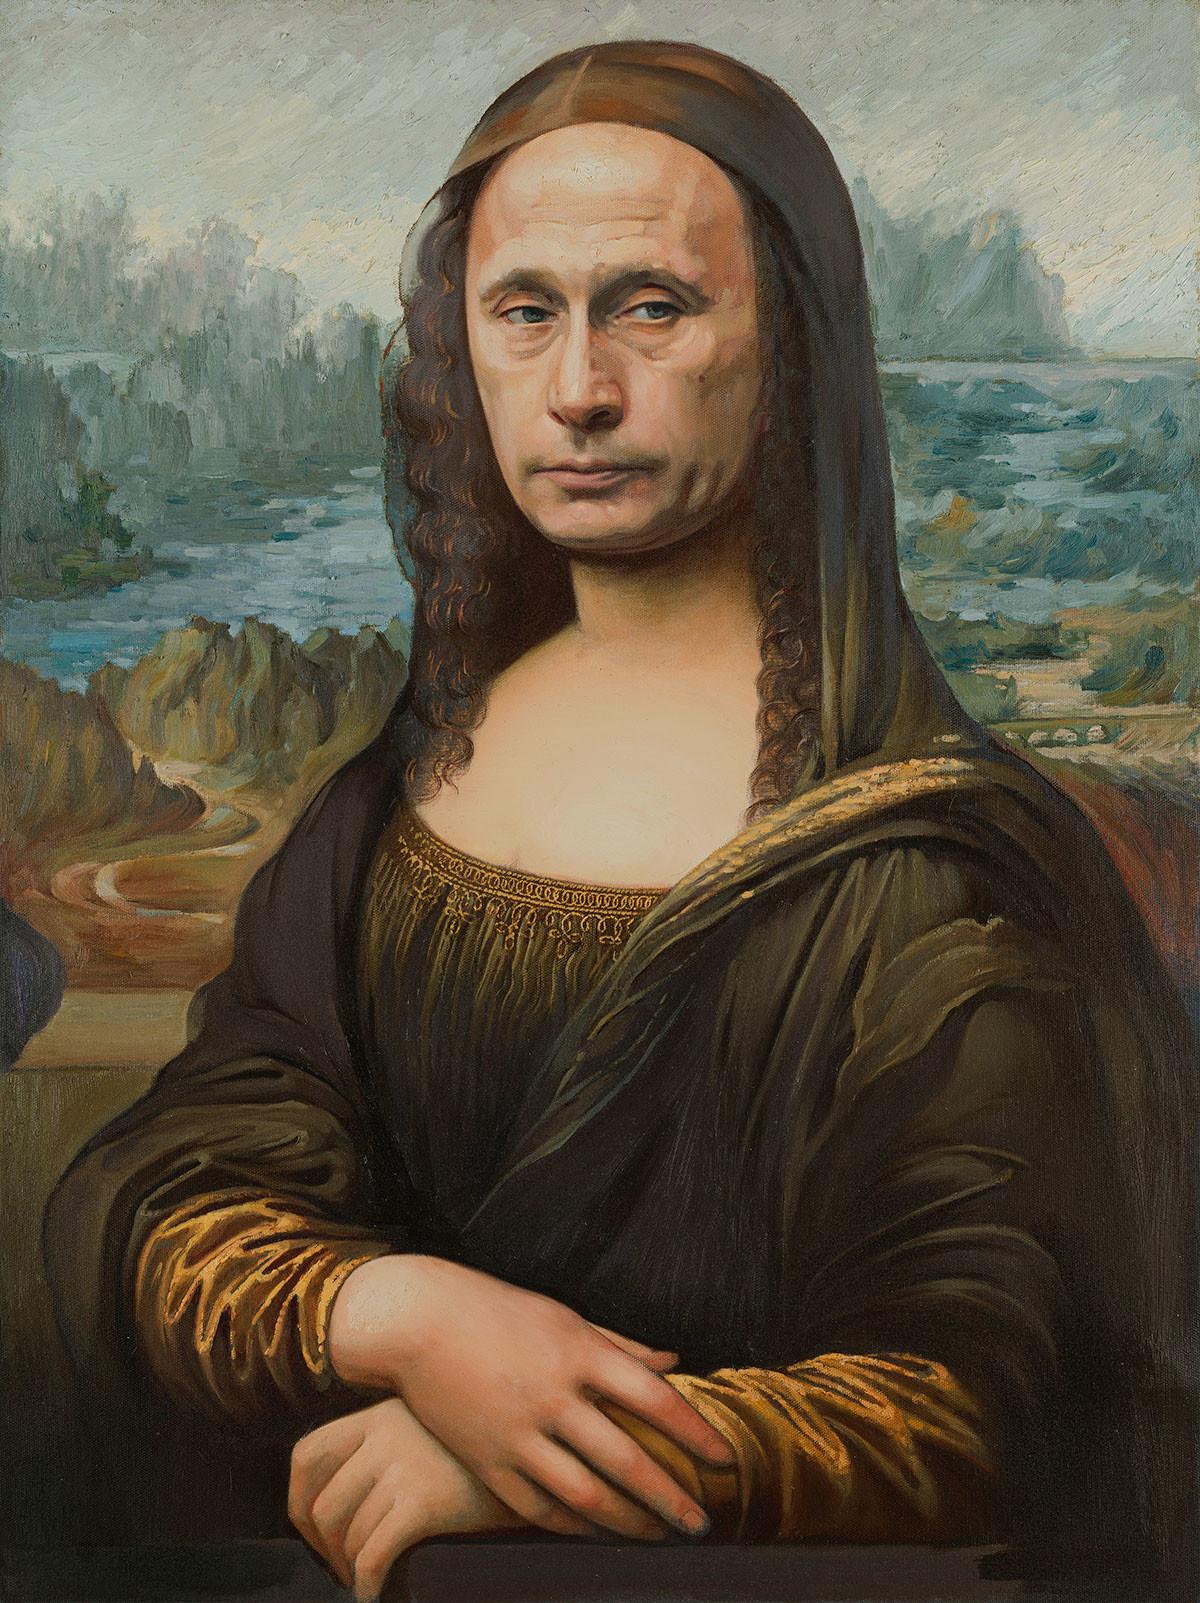 Mona Lisa par Alexandre Kossolapov, 2020